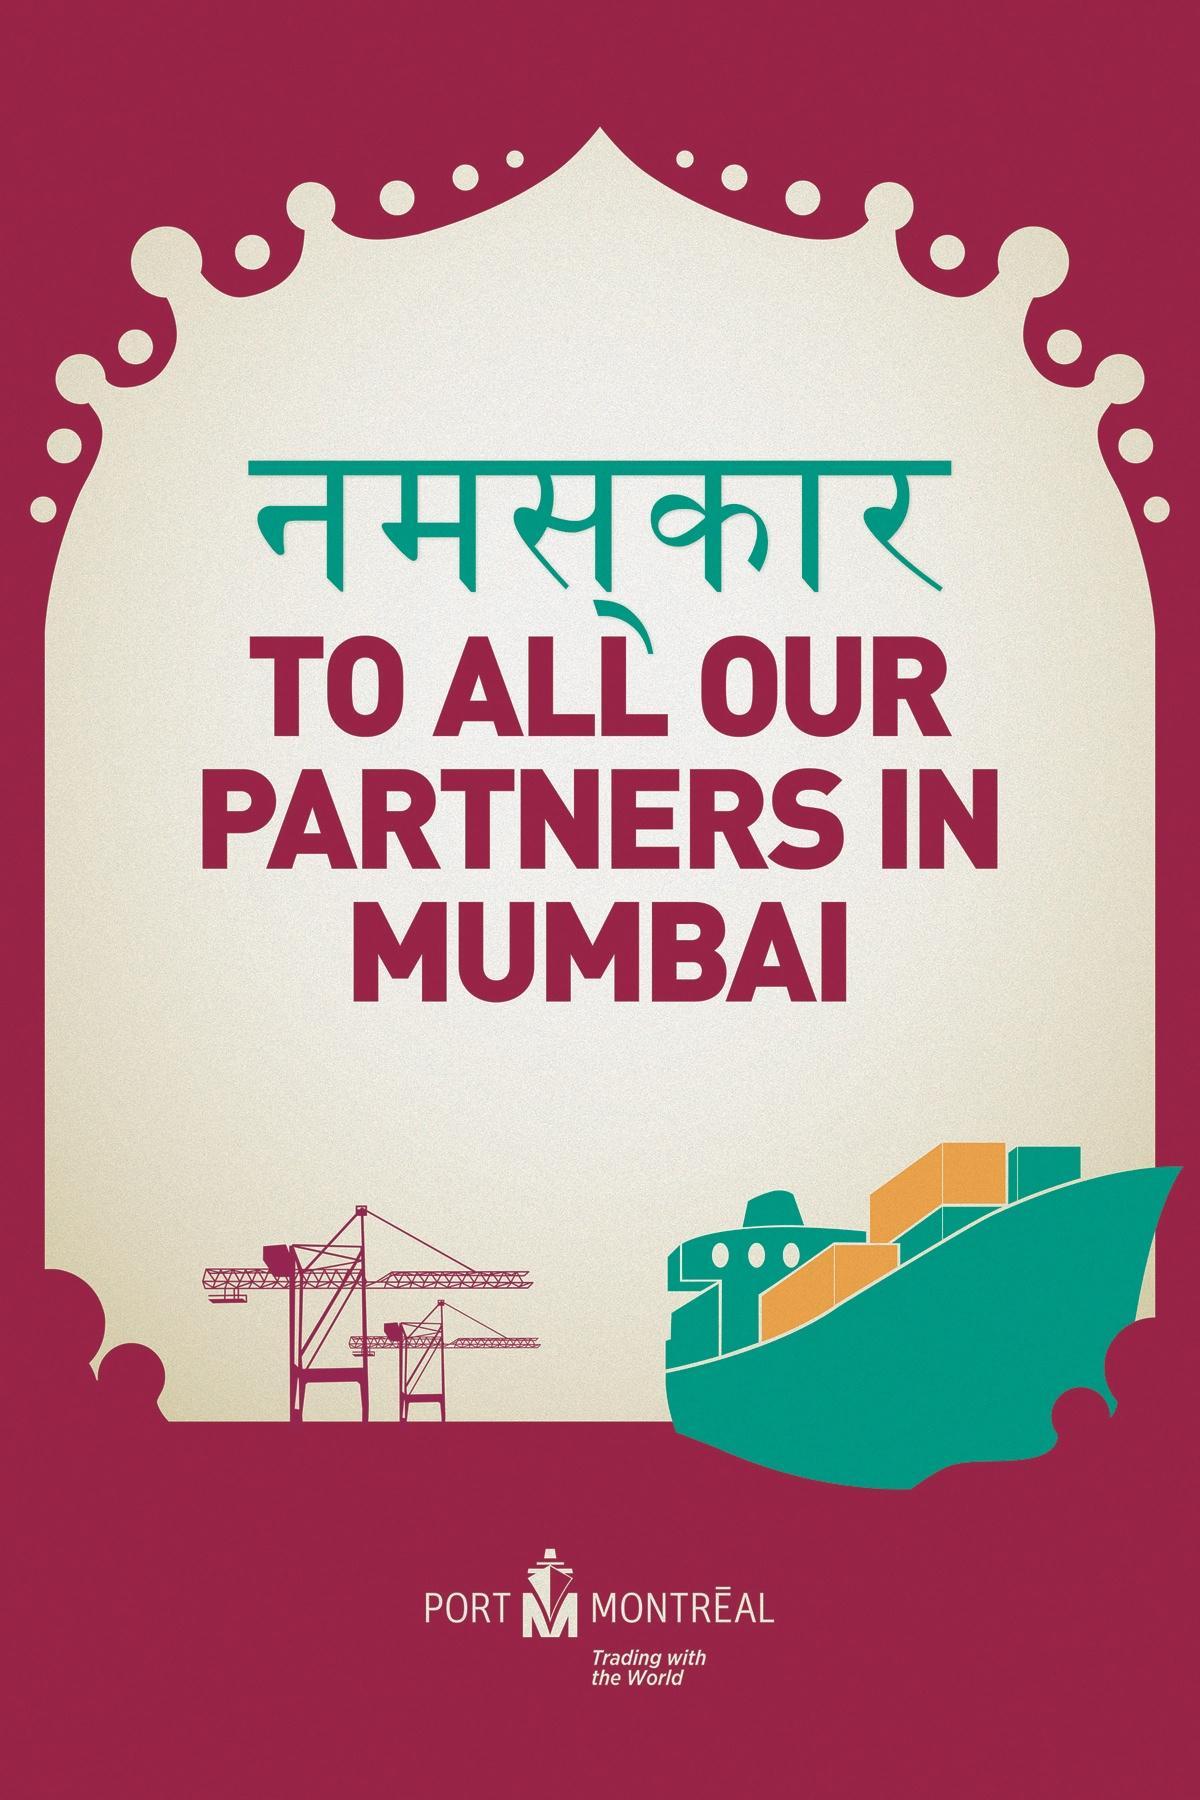 Montreal Port Authority Outdoor Ad -  Mumbai